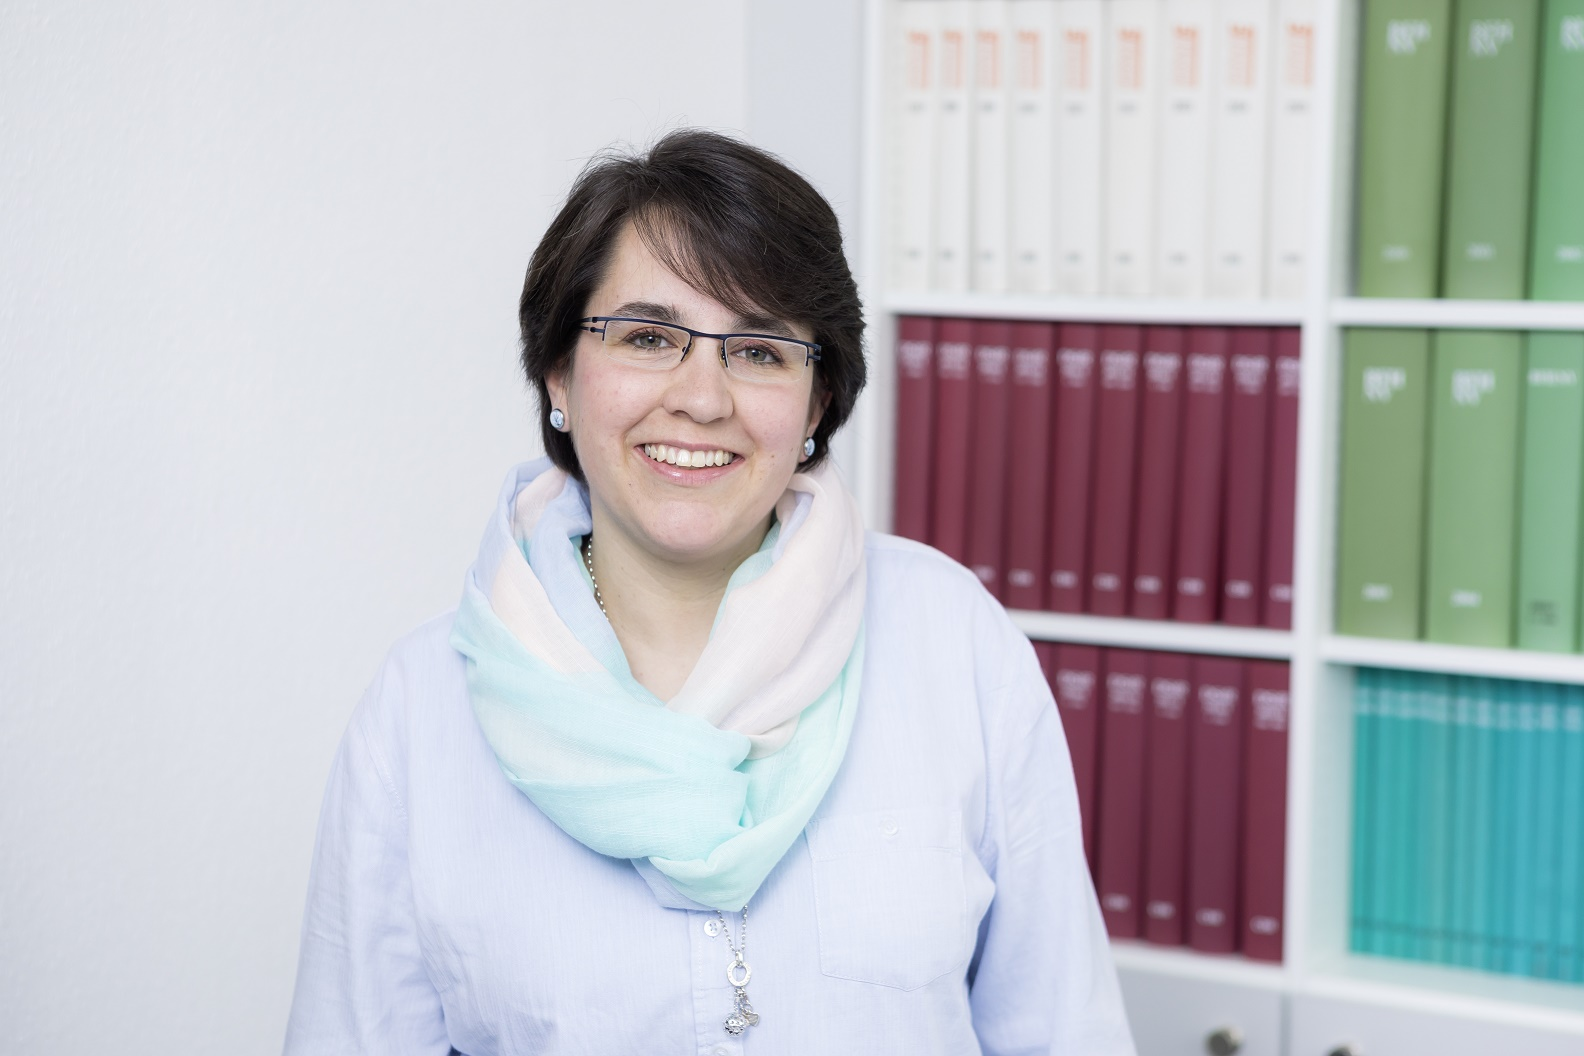 Julia Orgel